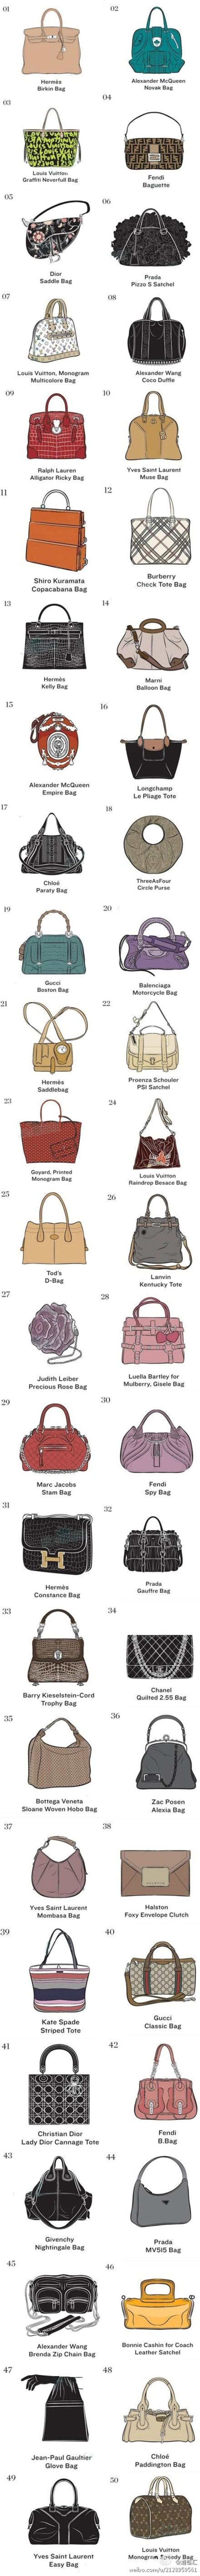 Hermes, Gucci, Prada, Dior